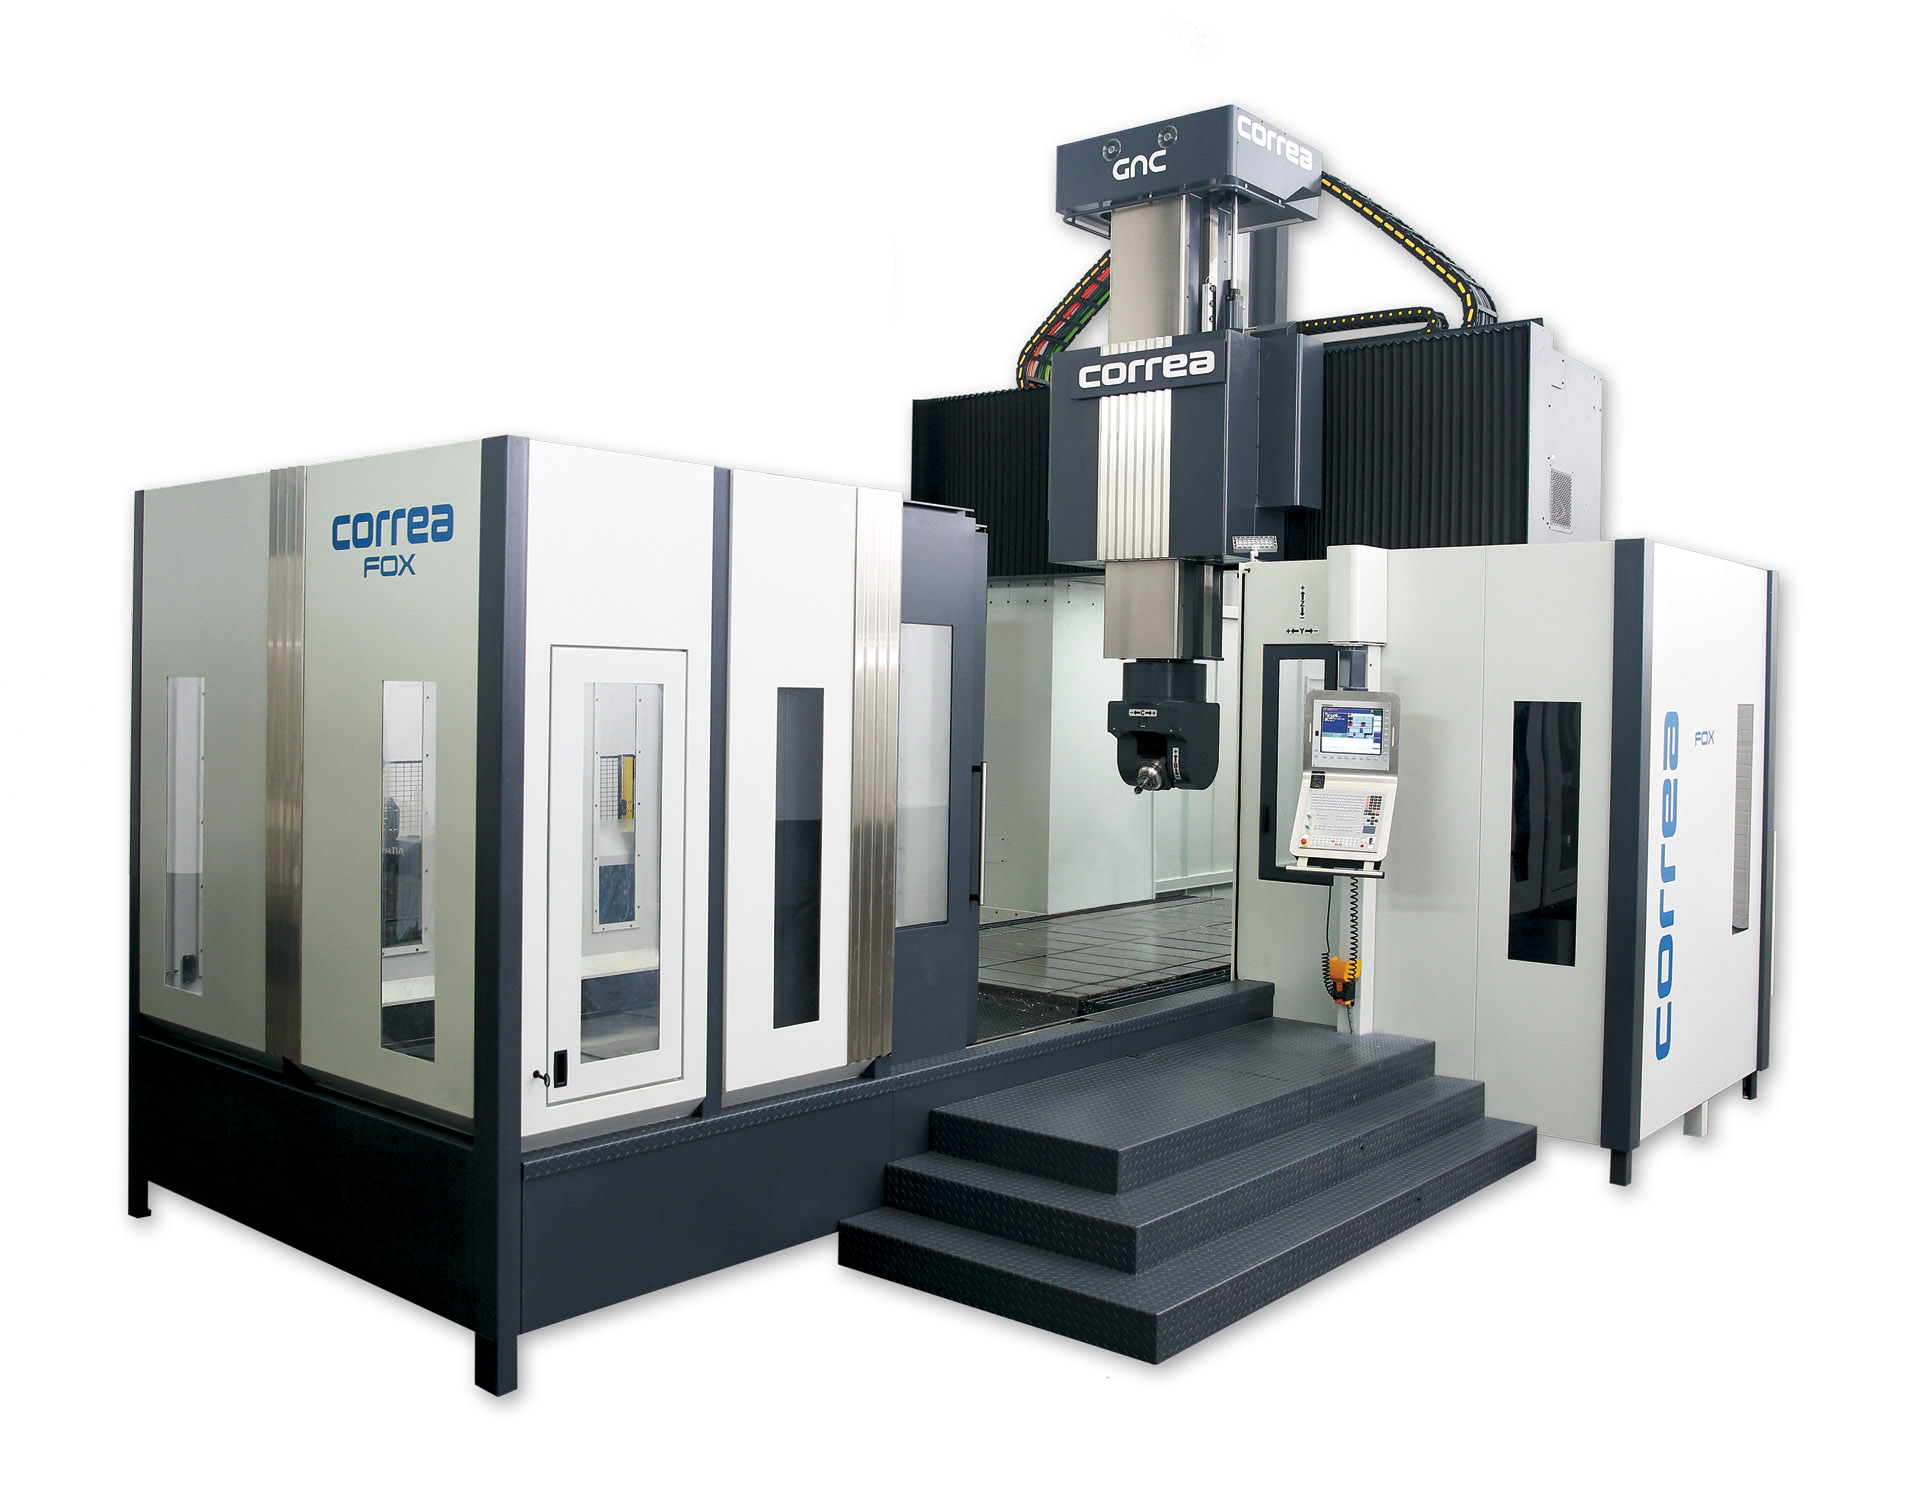 FOX-milling-machine1 (1).jpg